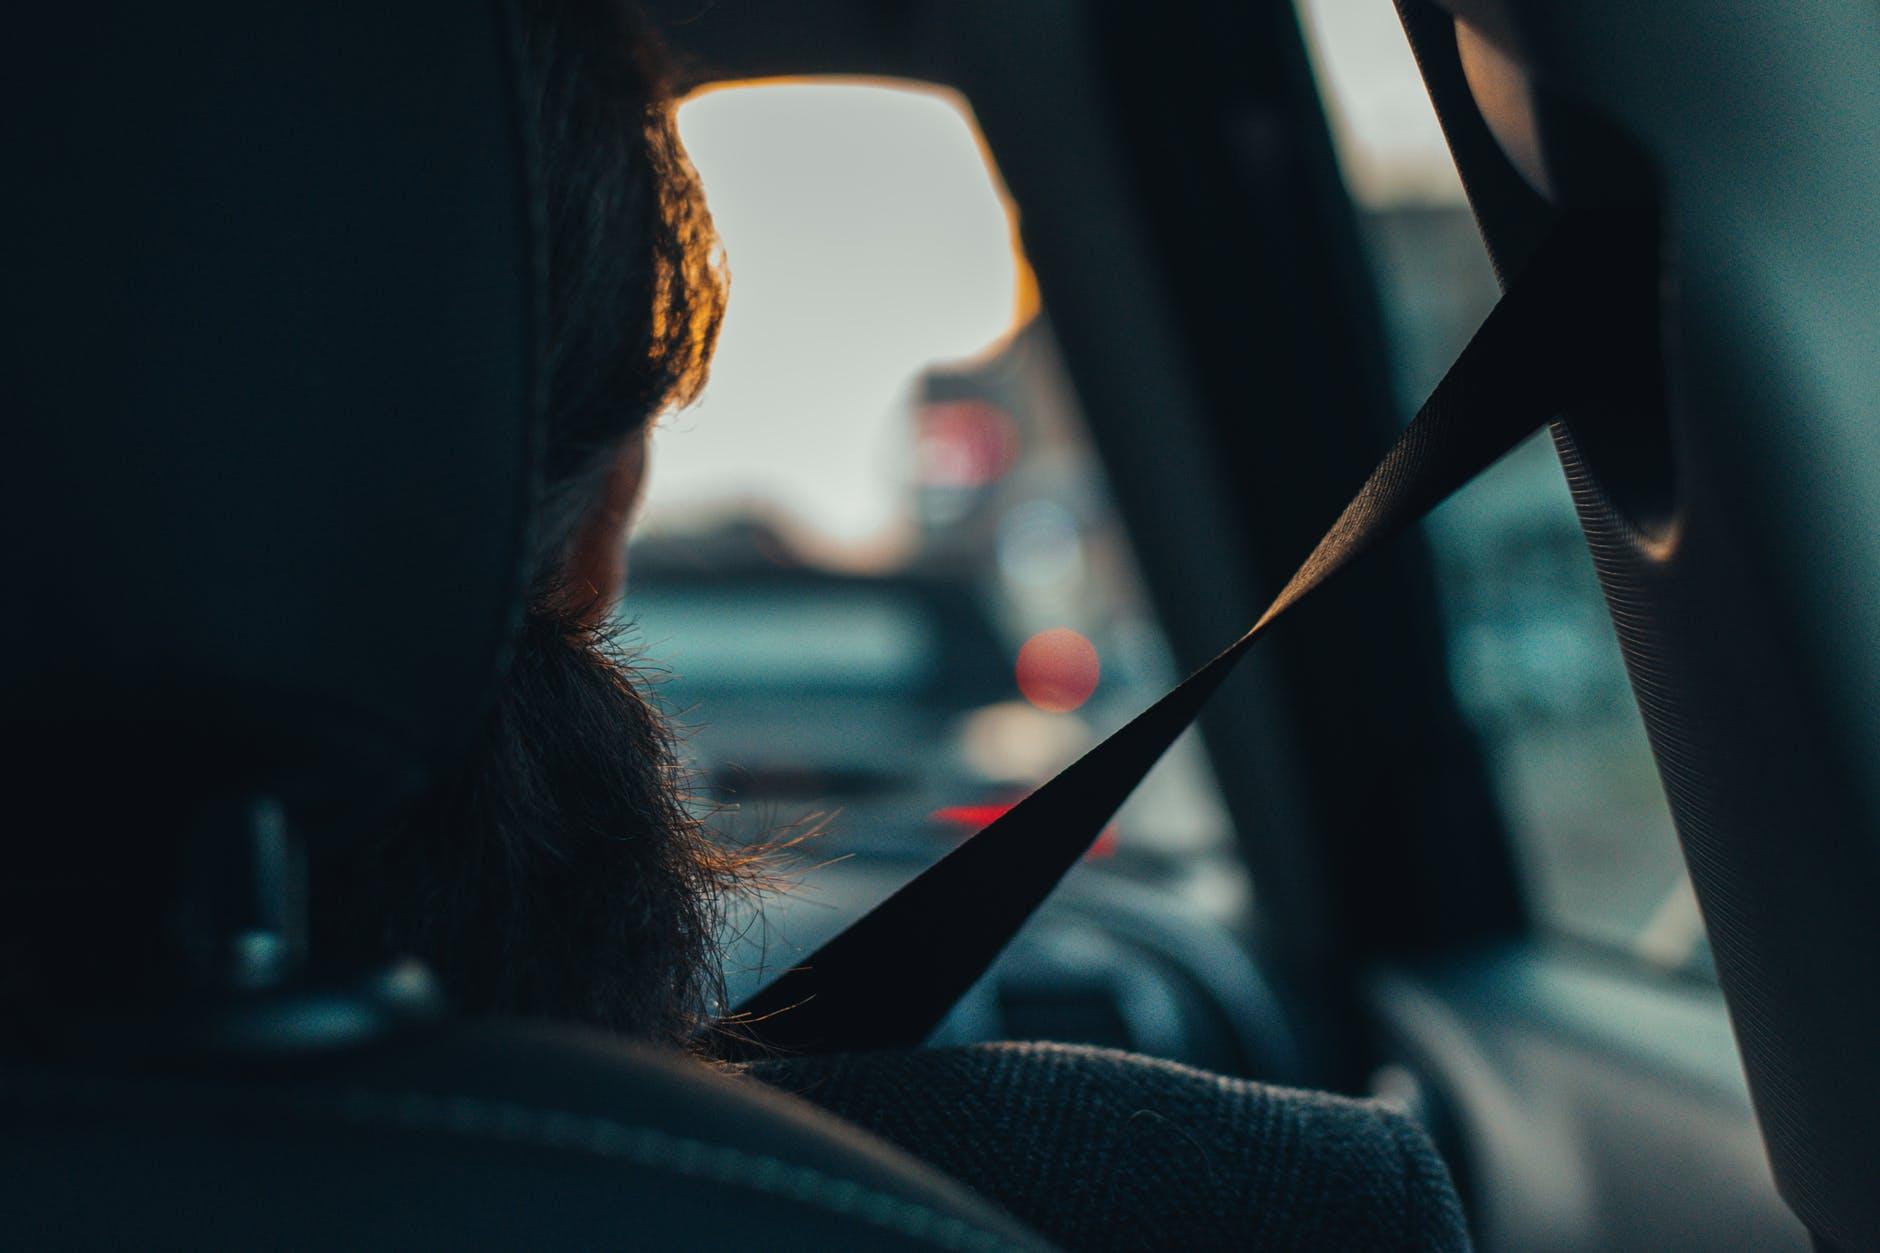 Cabify-Road Safety.Seatbelt.jpeg